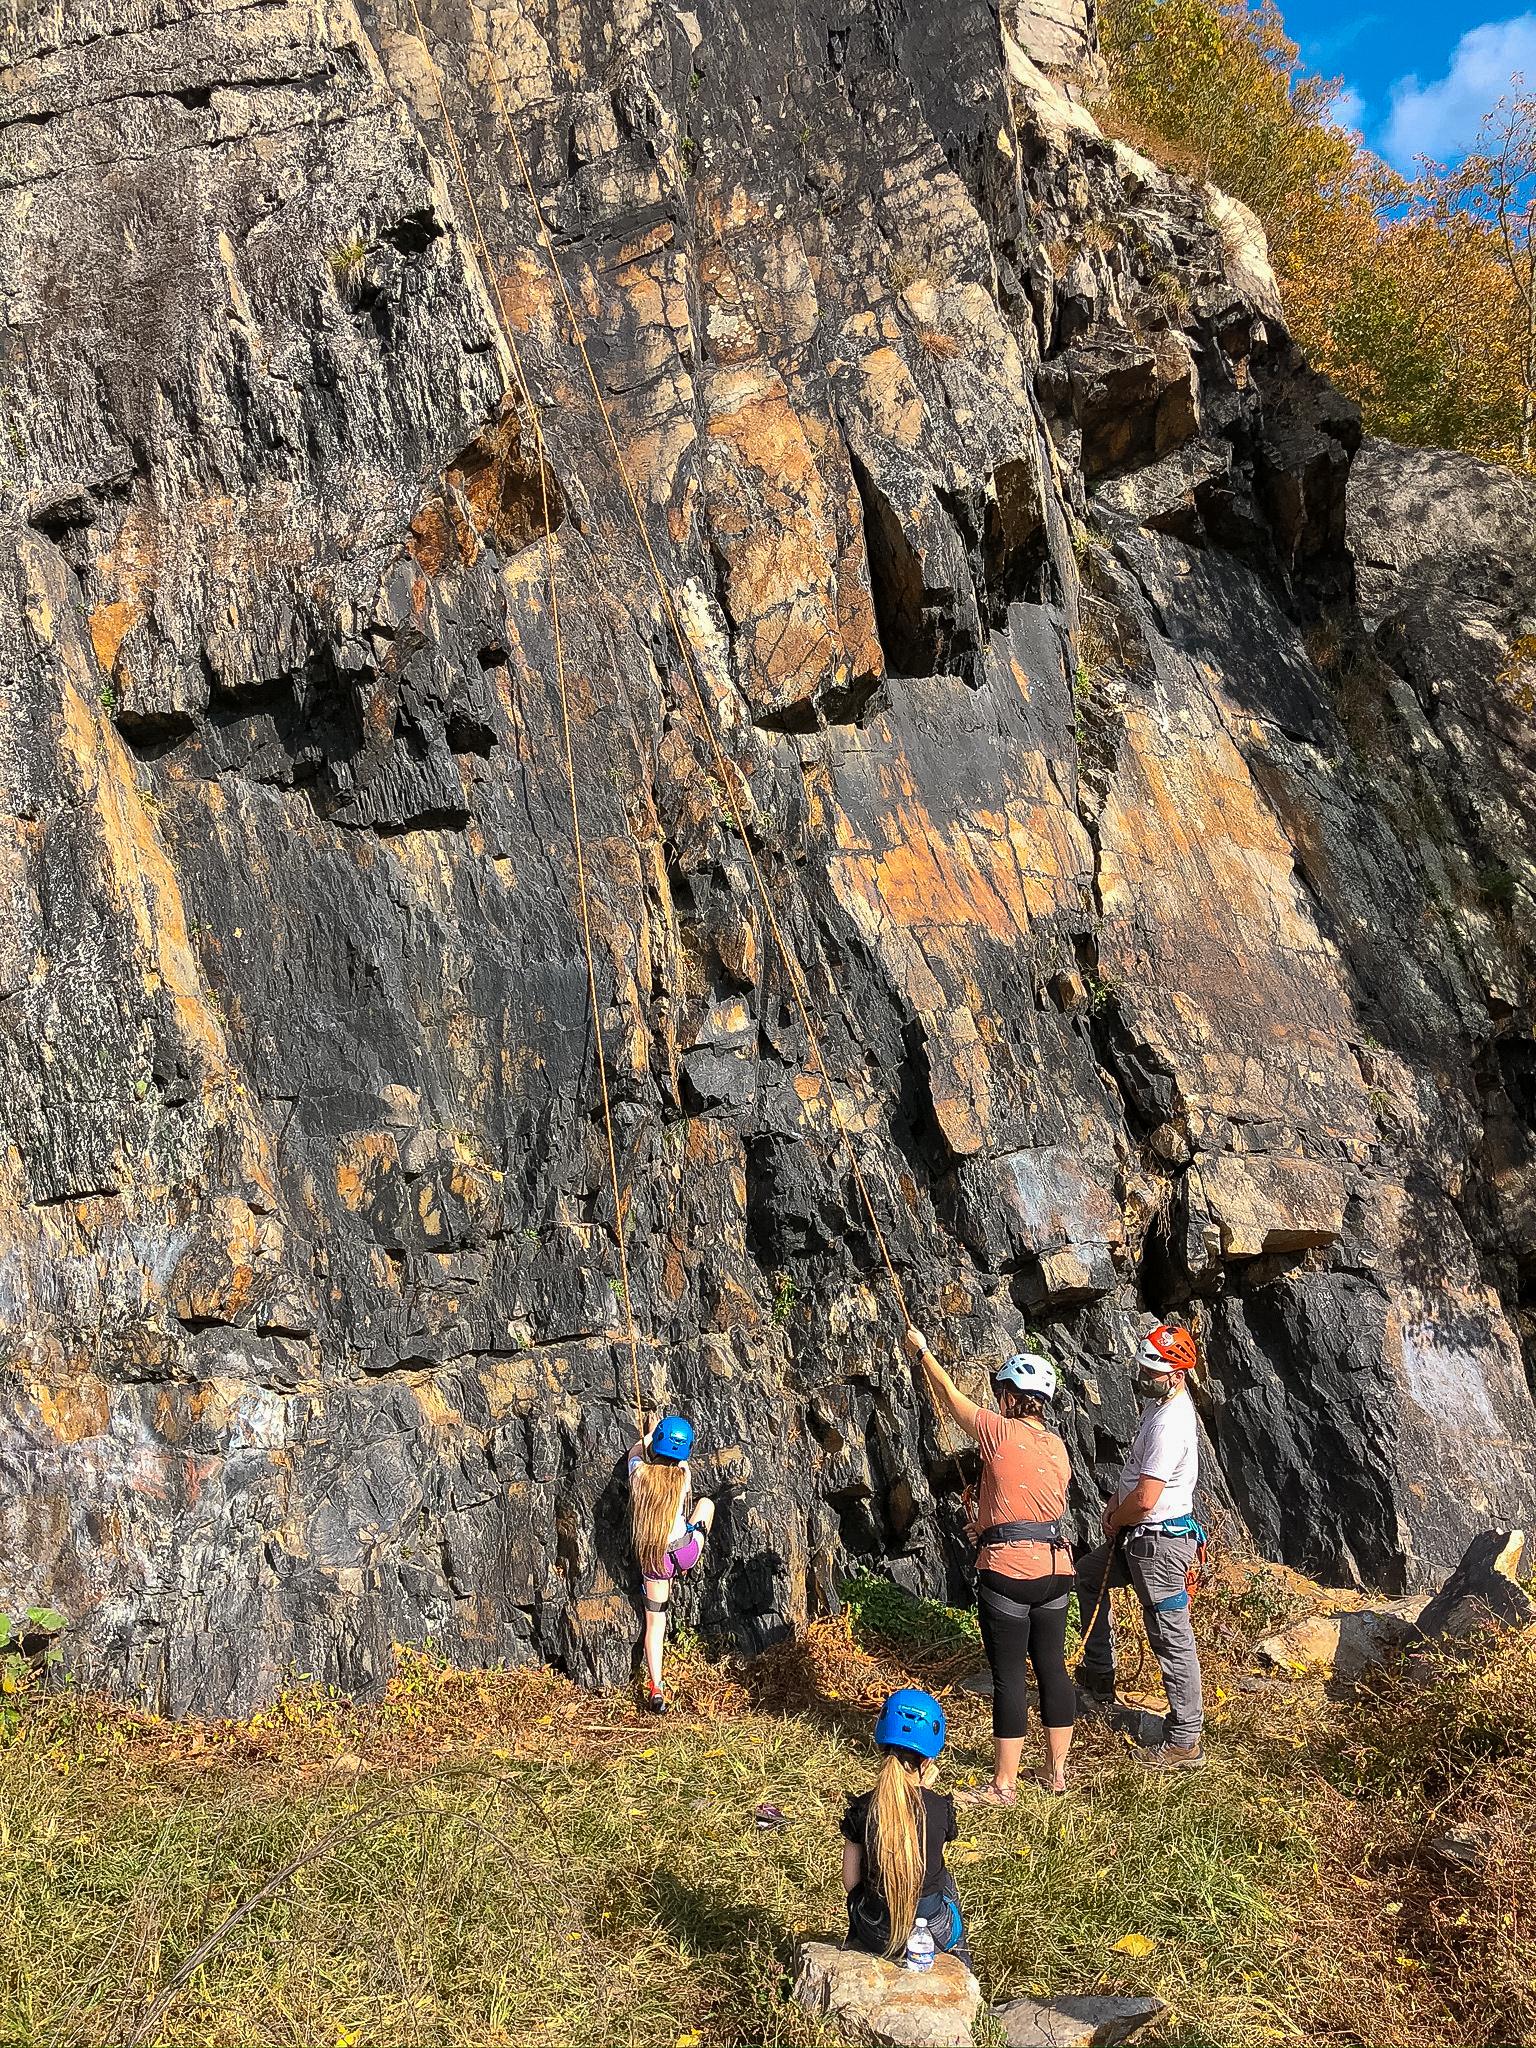 Rock climbing family at Chickies Rock